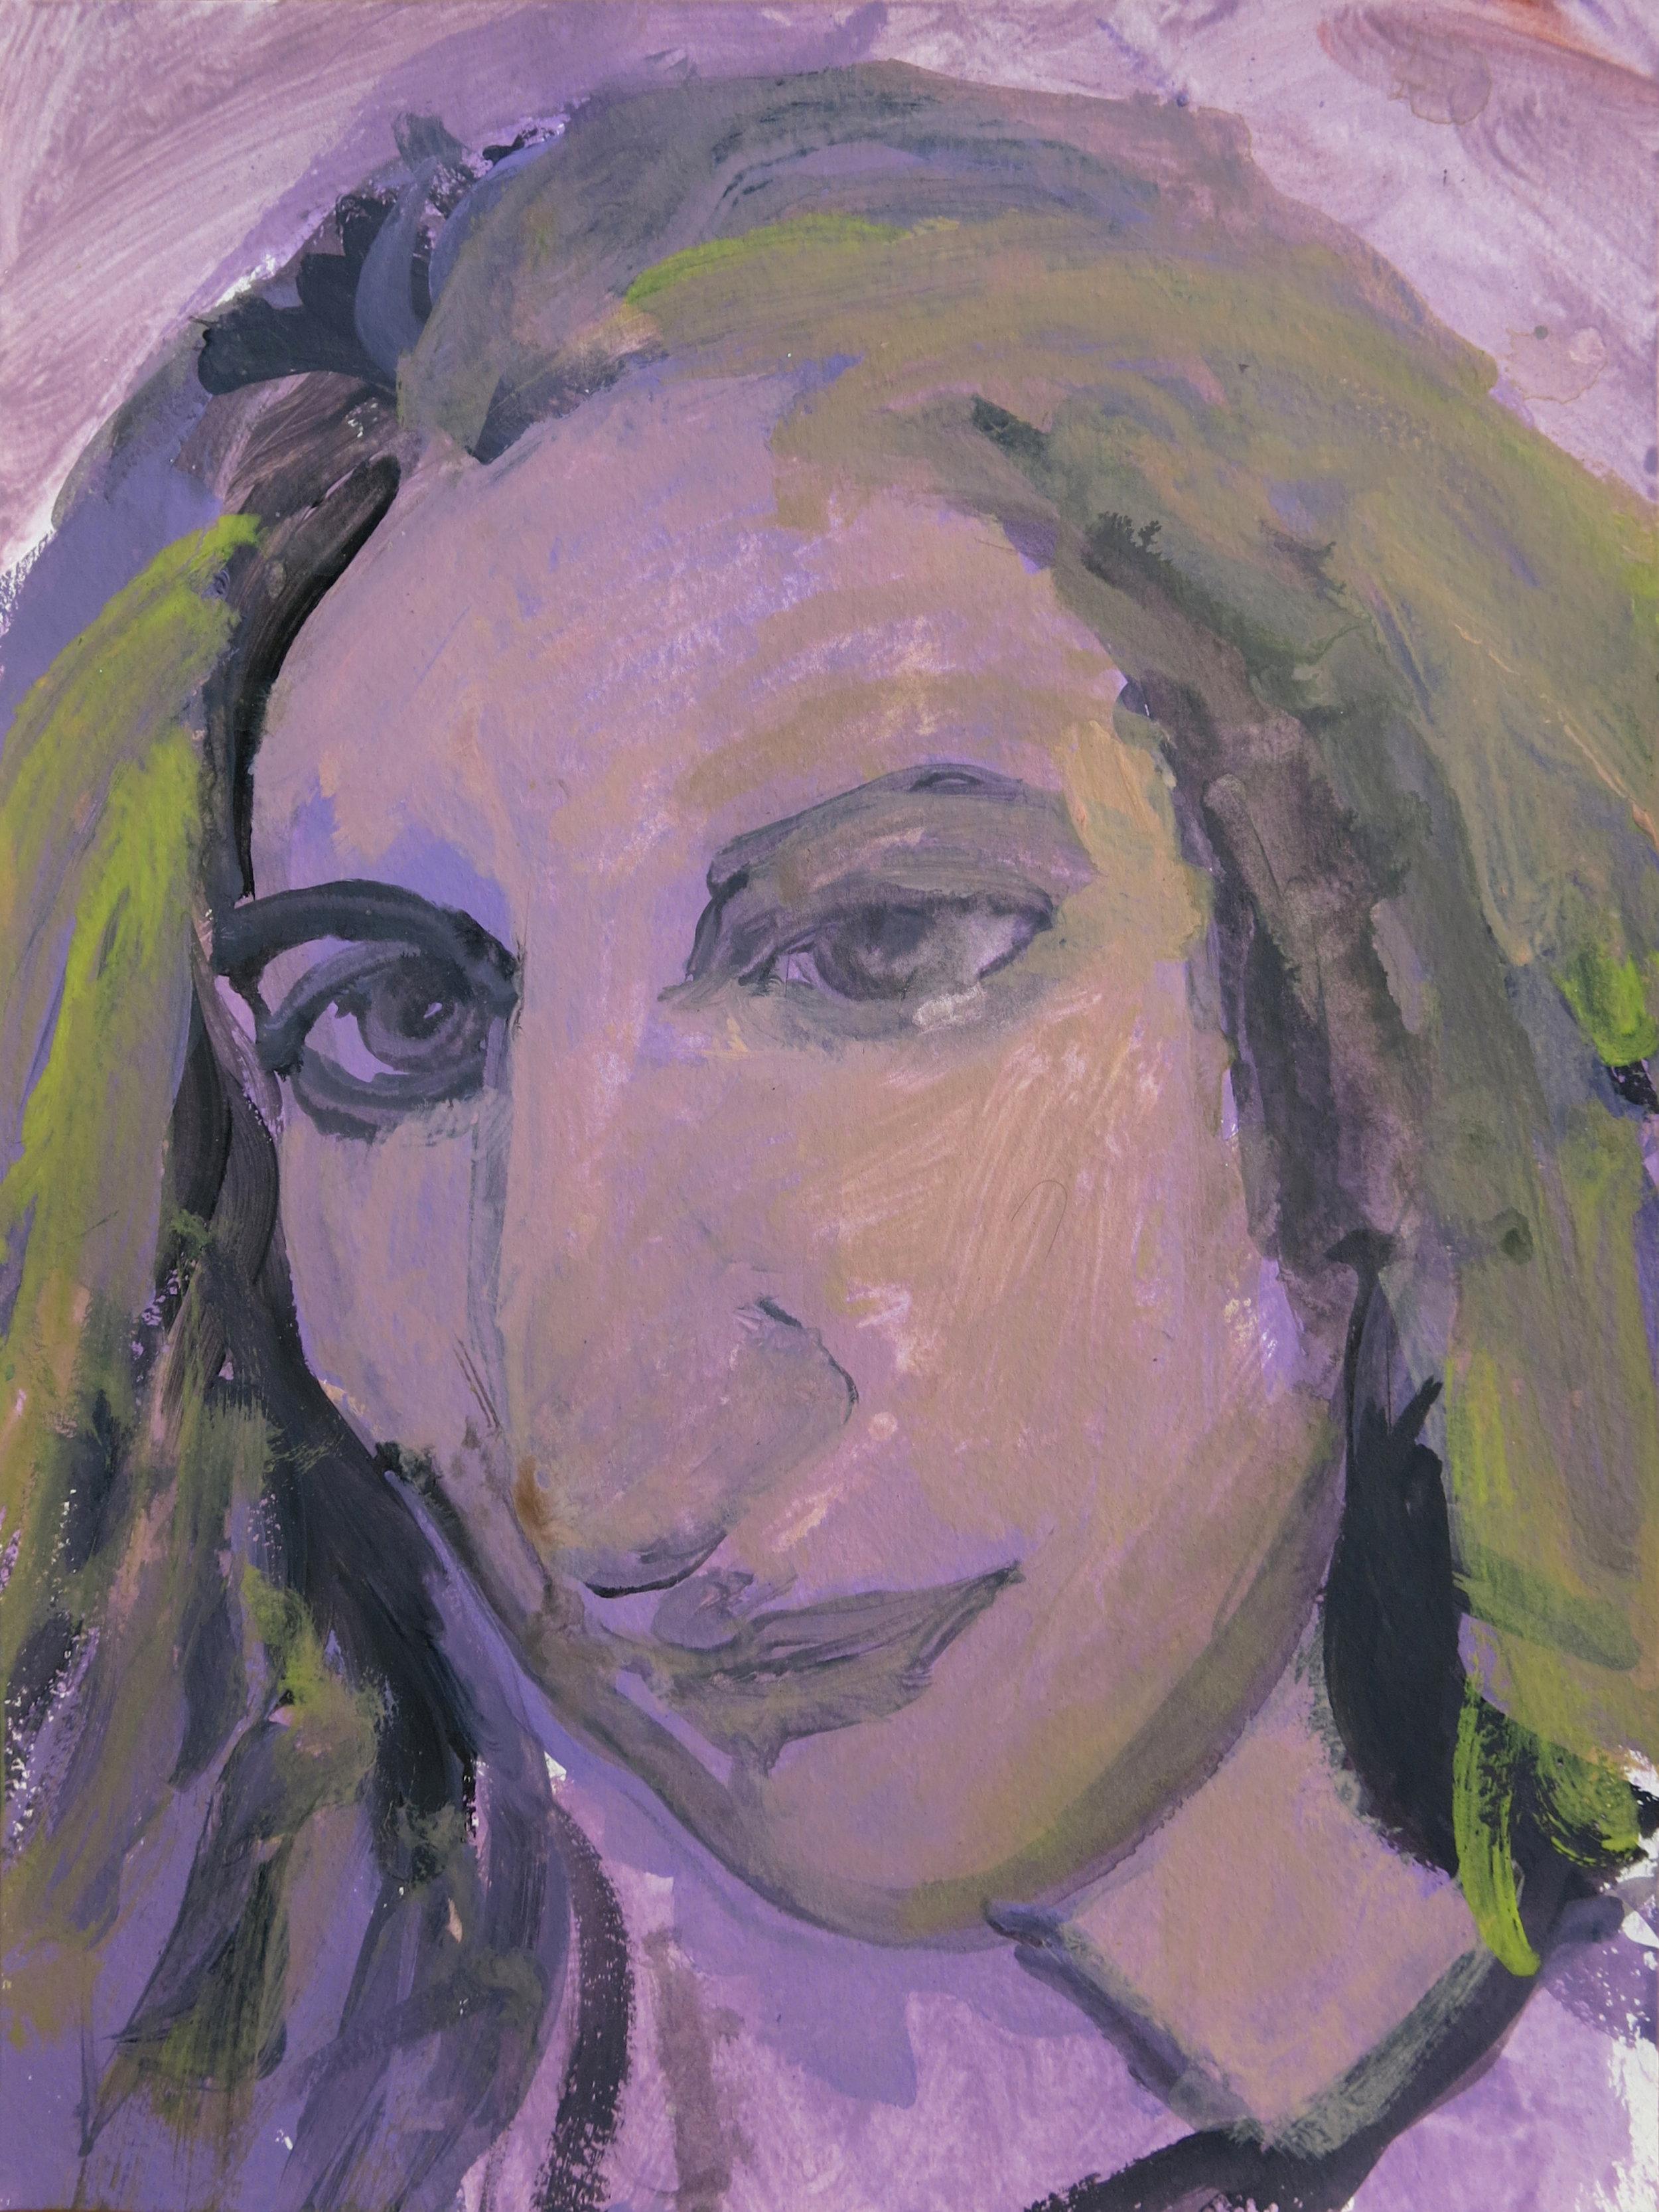 Barbra Streisand Portrait #22